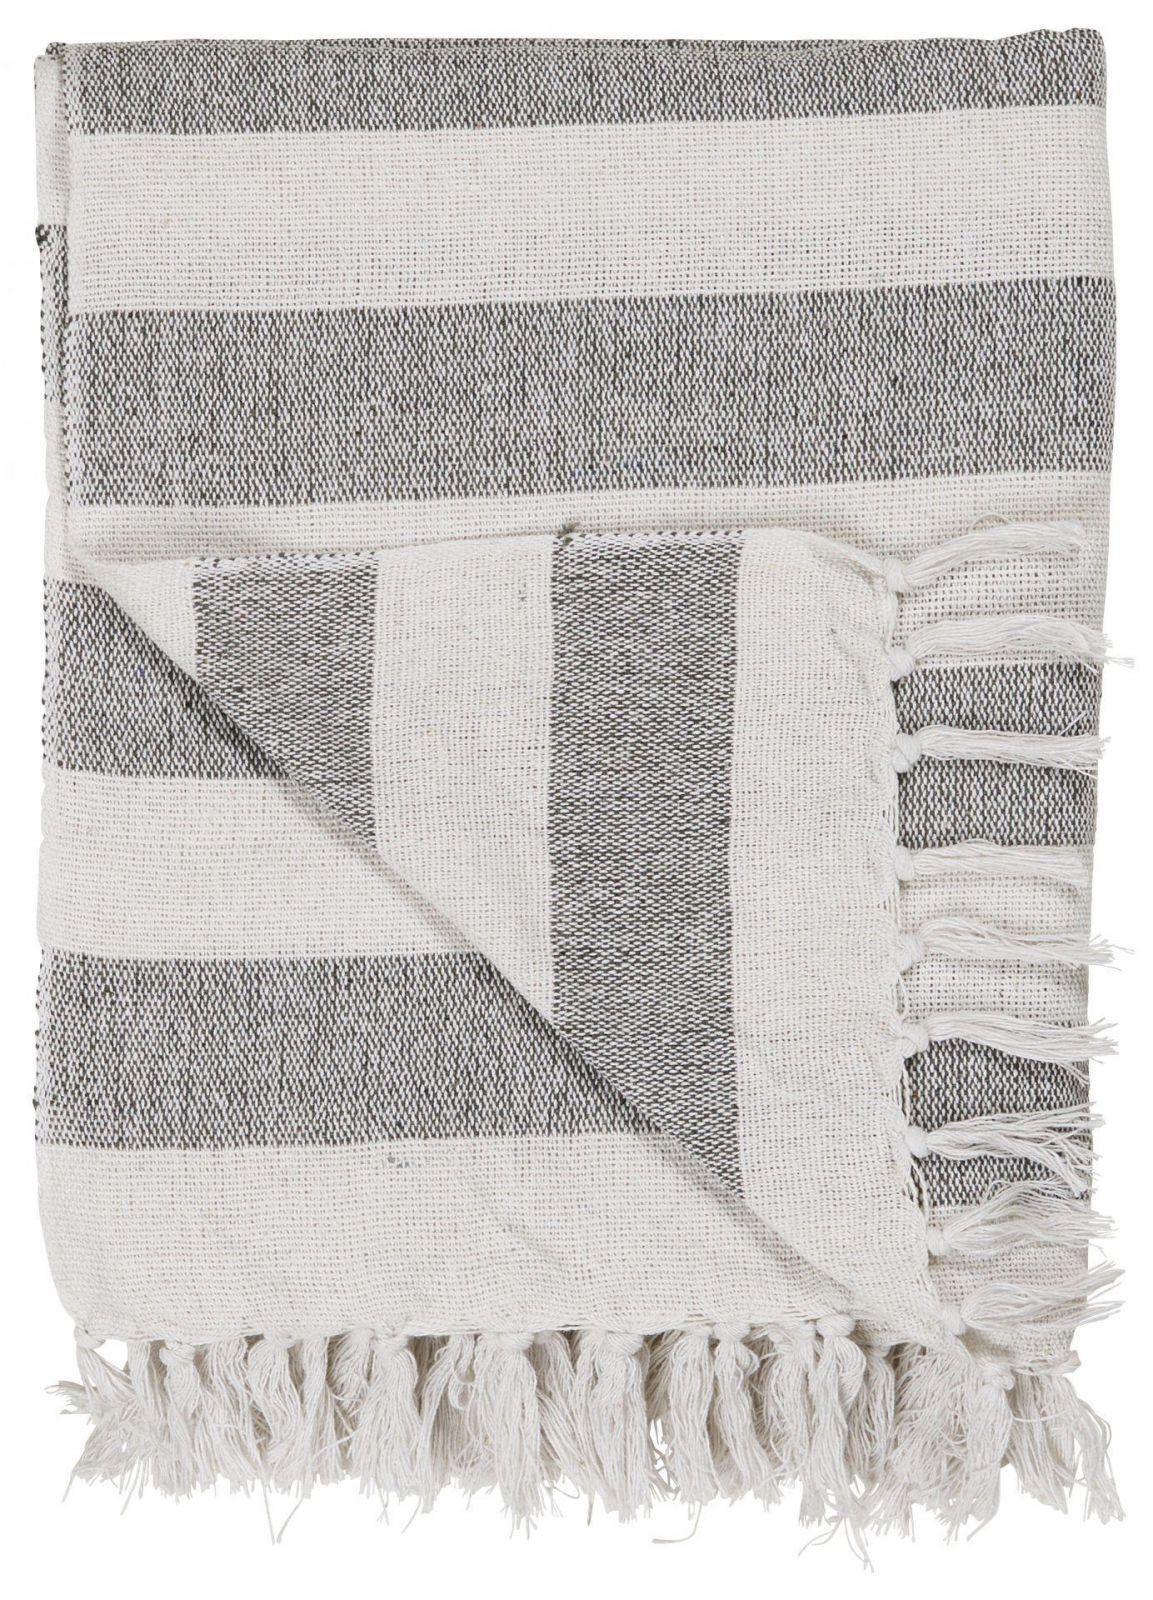 IB LAURSEN Bavlněný přehoz Black Stripes 130x160 cm